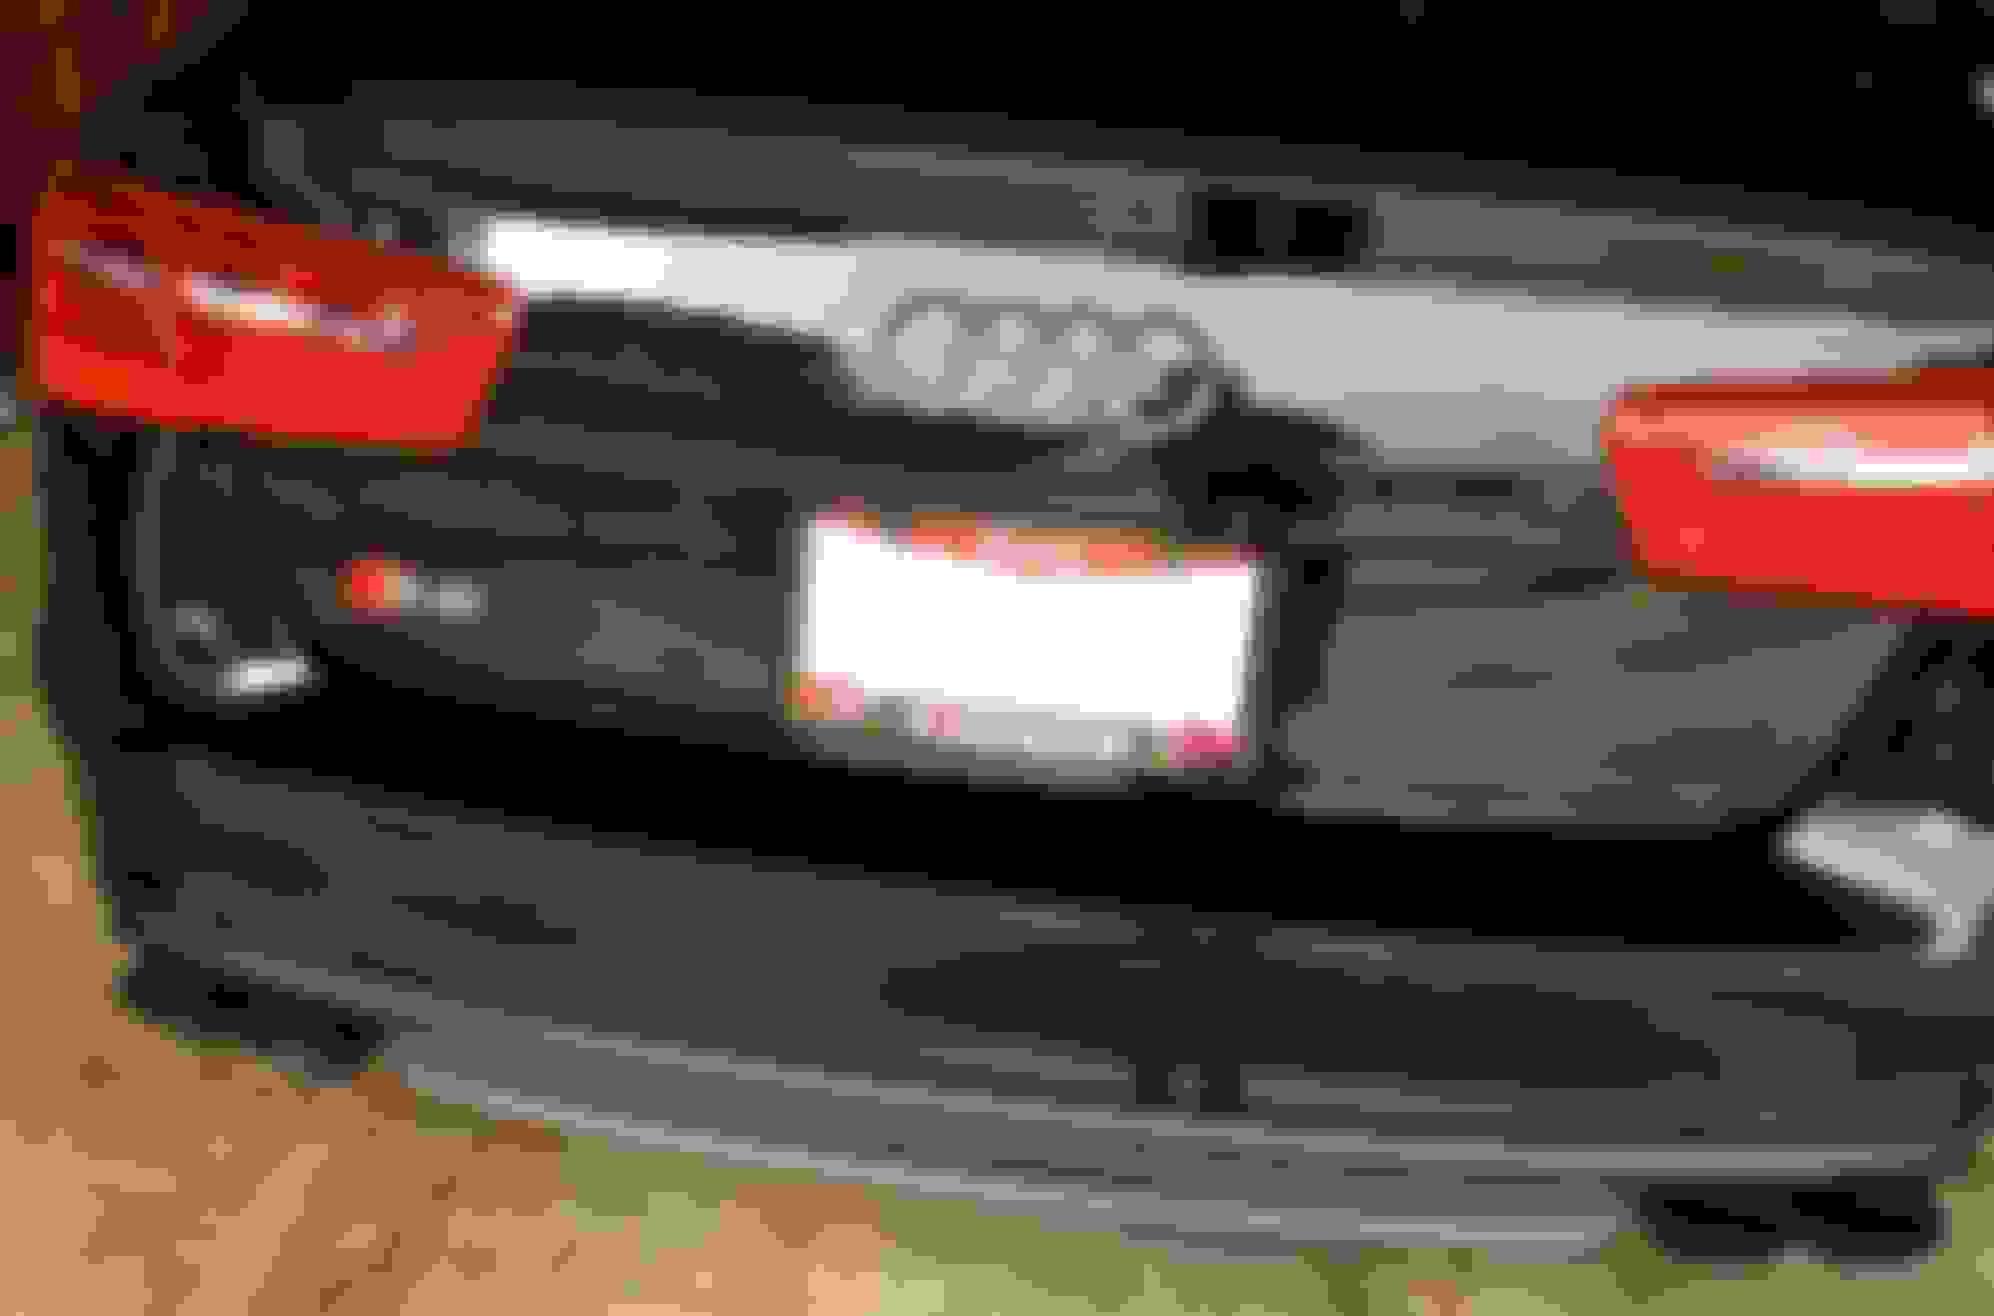 Black Covercraft Custom Fit Car Cover for Select Chevrolet Models FS10025F5 Fleeced Satin